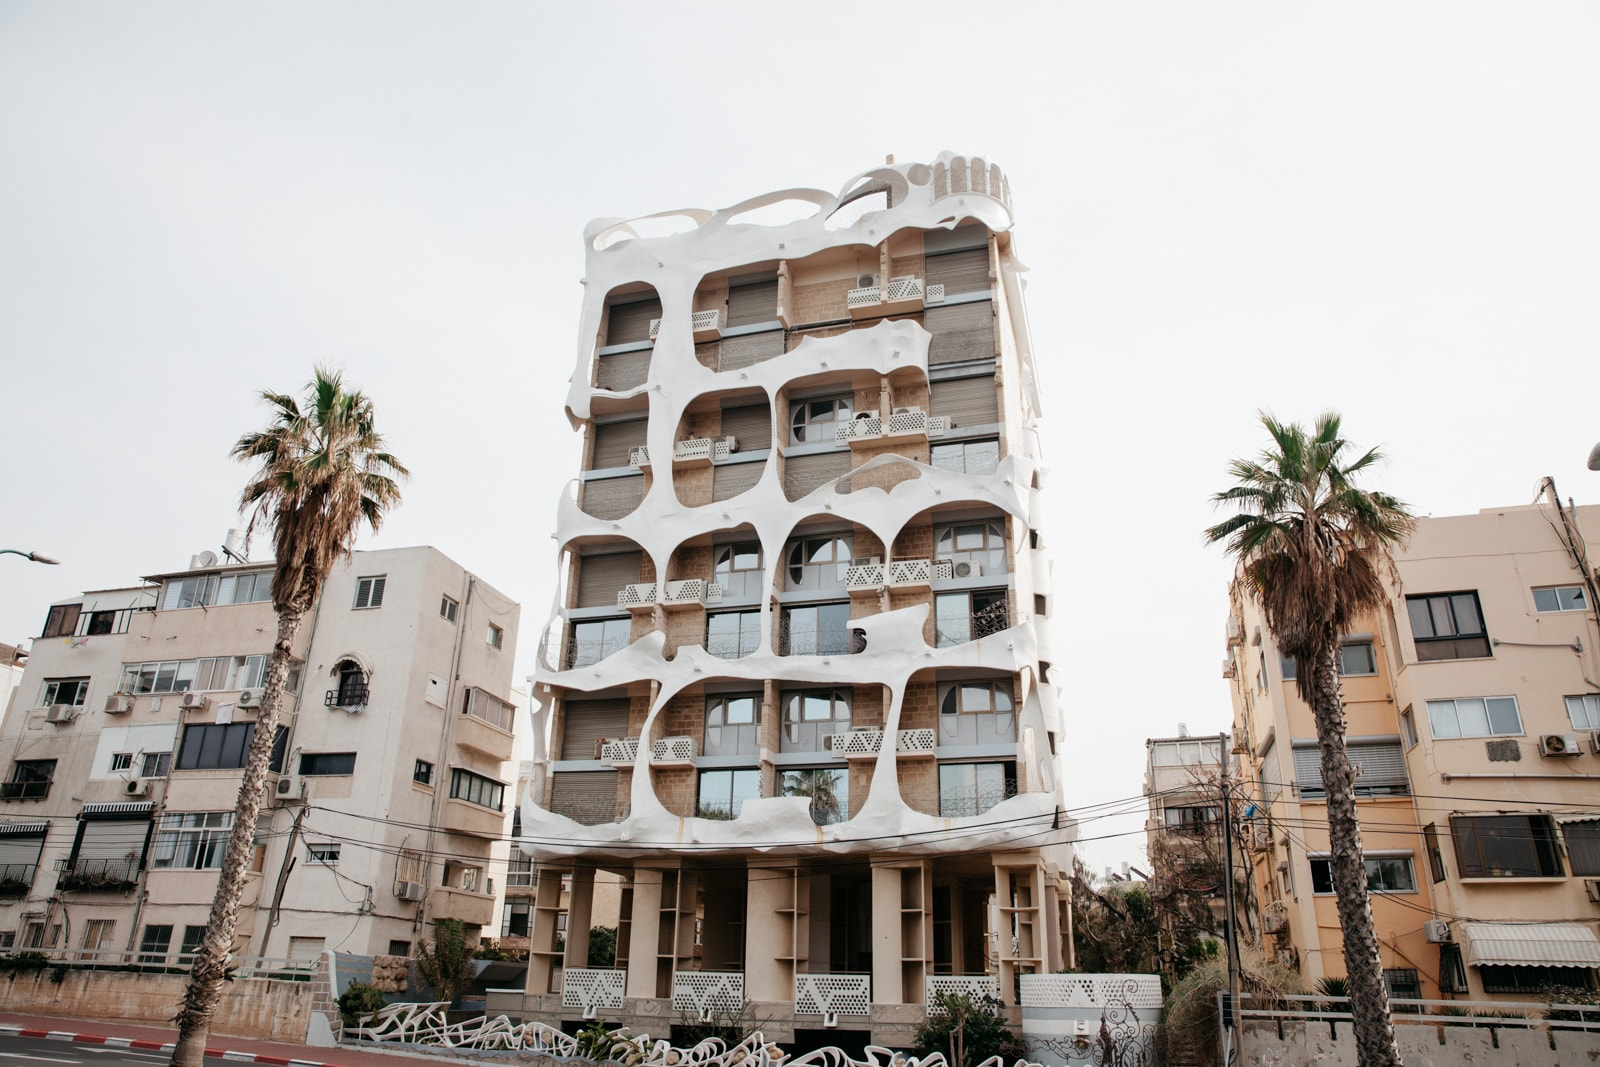 KCTP00019-THE CRAZY HOUSE-ARCHITECTURE-TEL AVIV-ISRAEL-GRANT